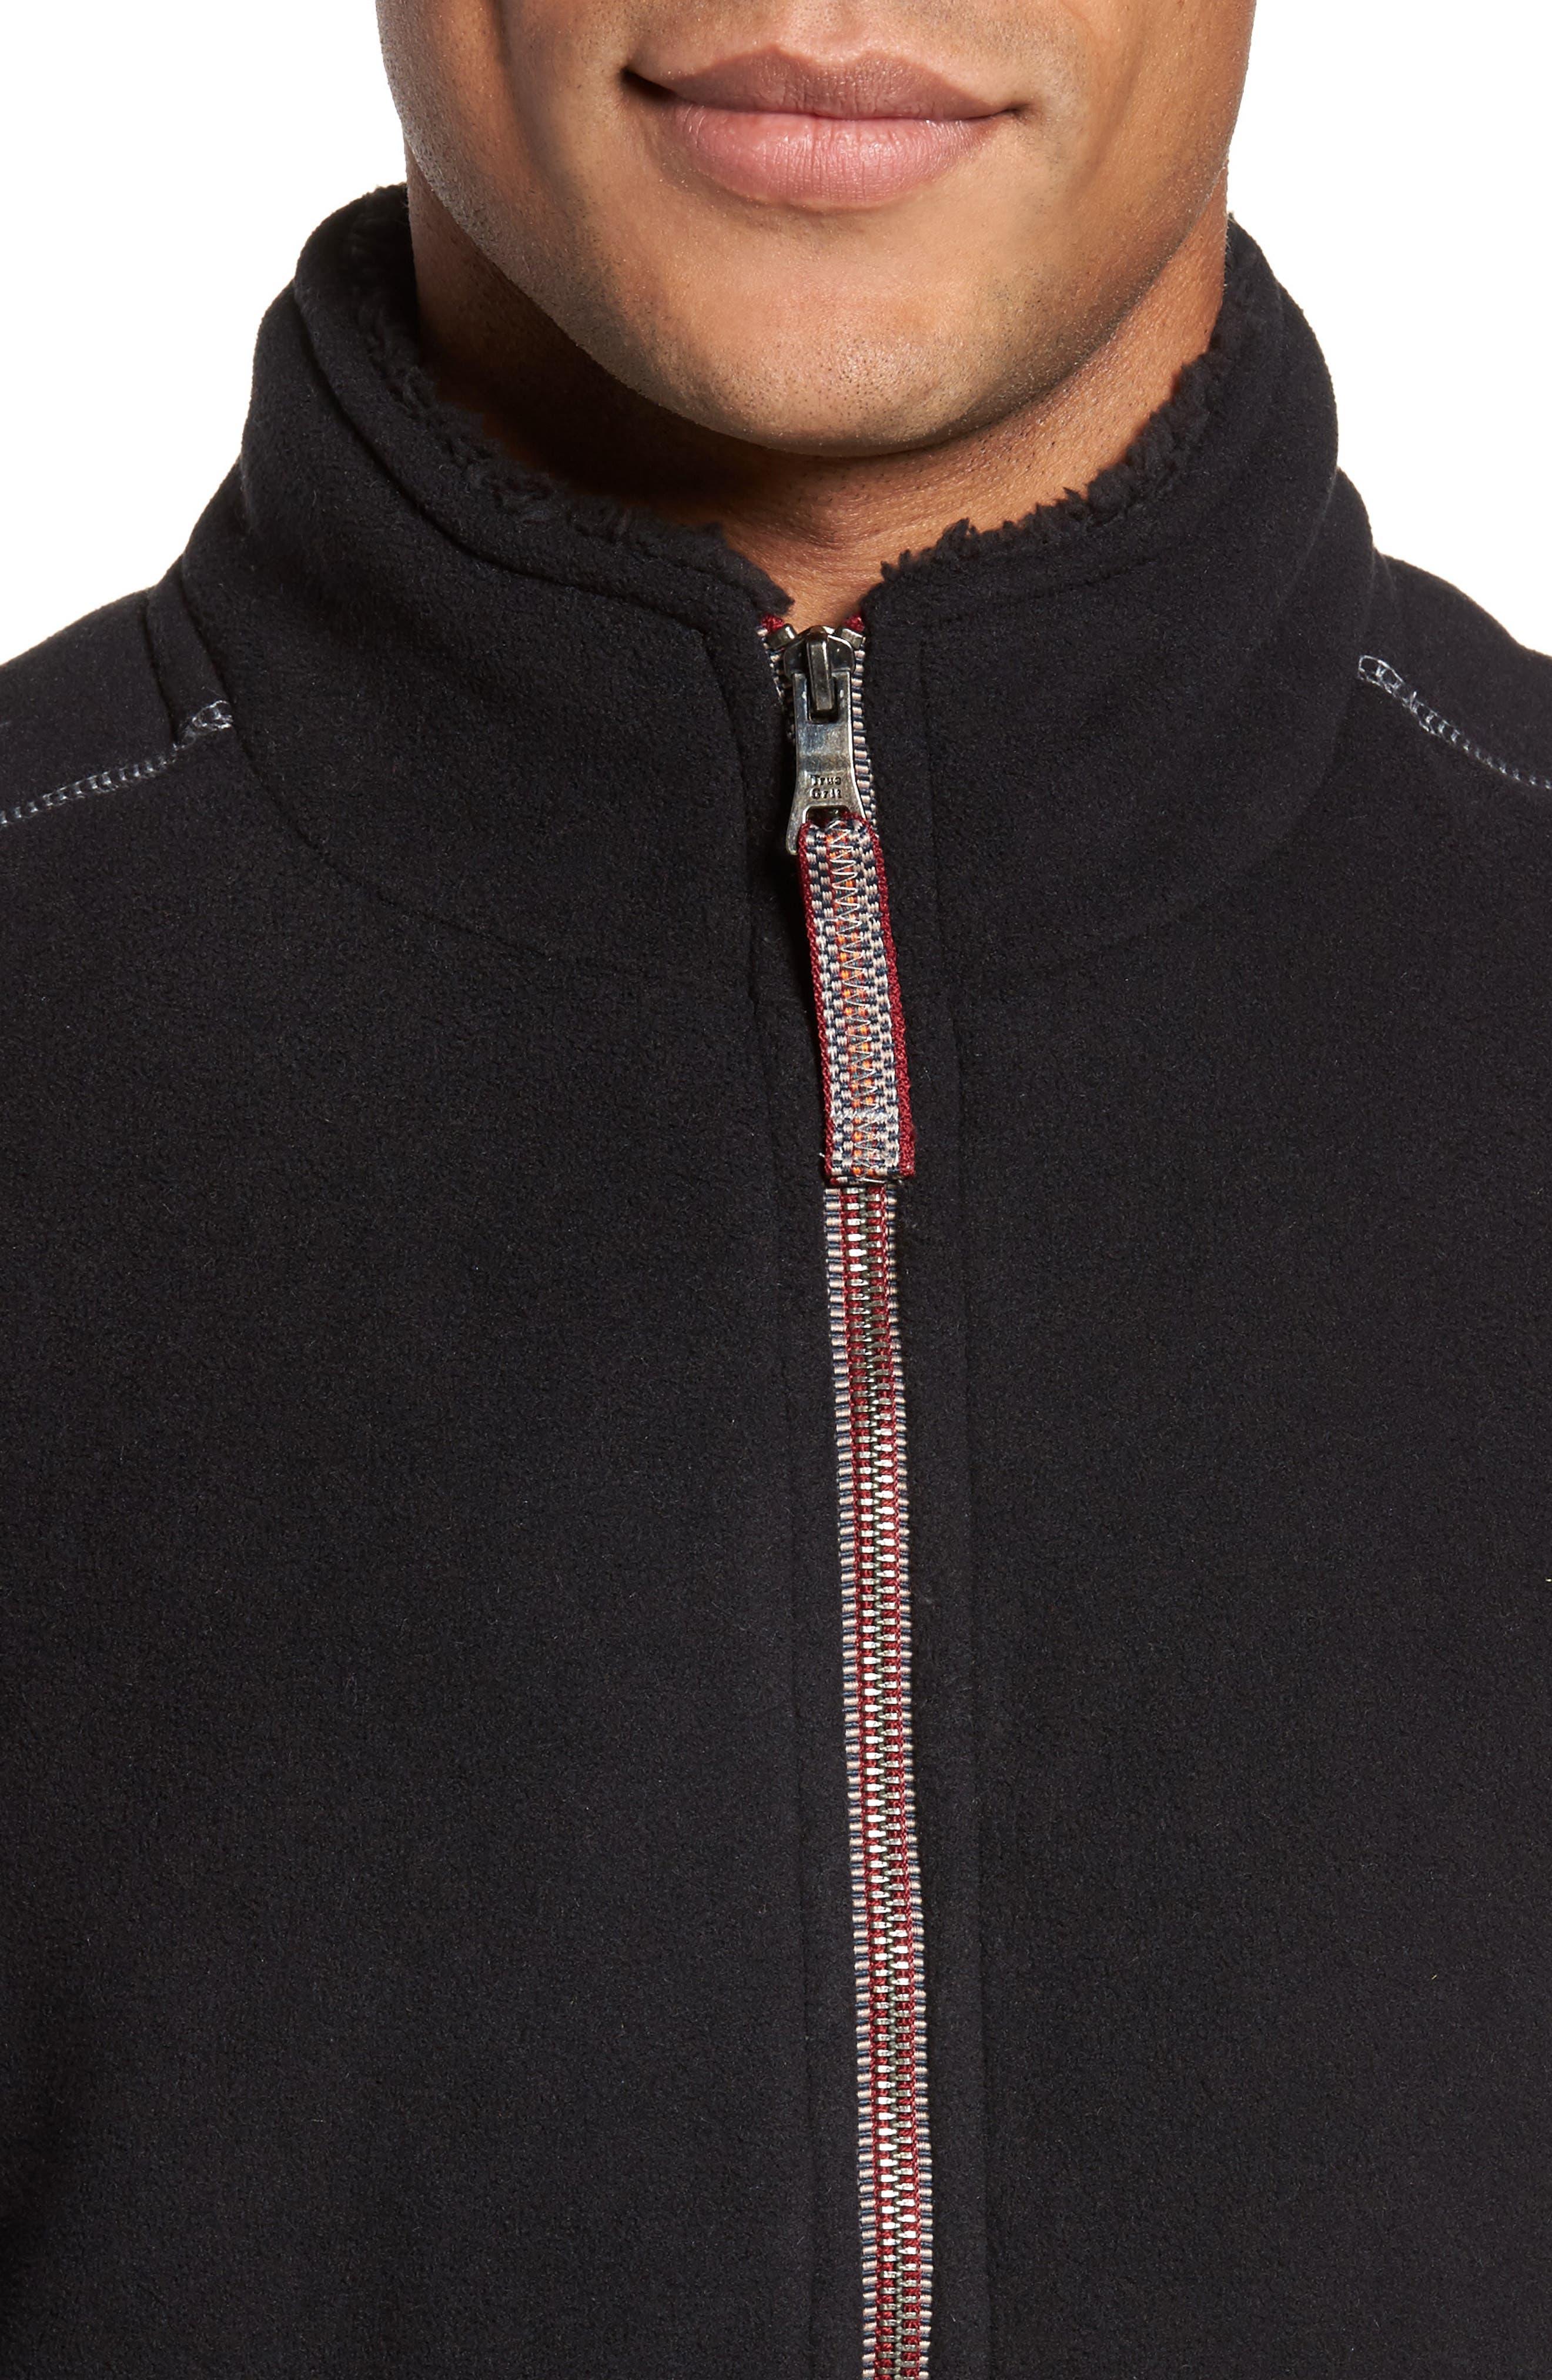 Bonded Fleece Zip Front Vest,                             Alternate thumbnail 4, color,                             001